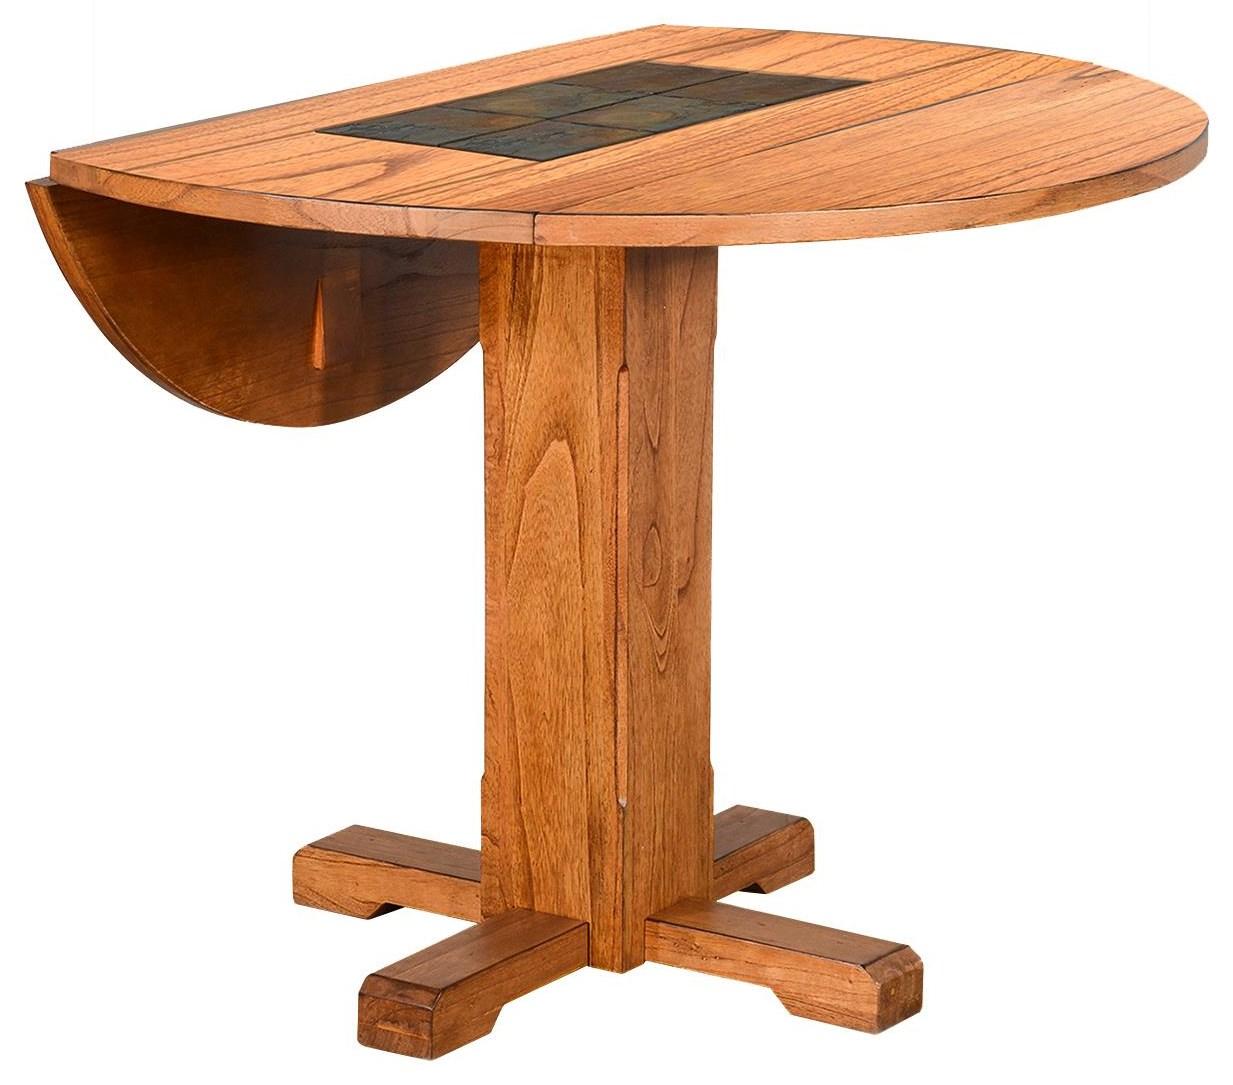 Drop Leaf Table at Sadler's Home Furnishings